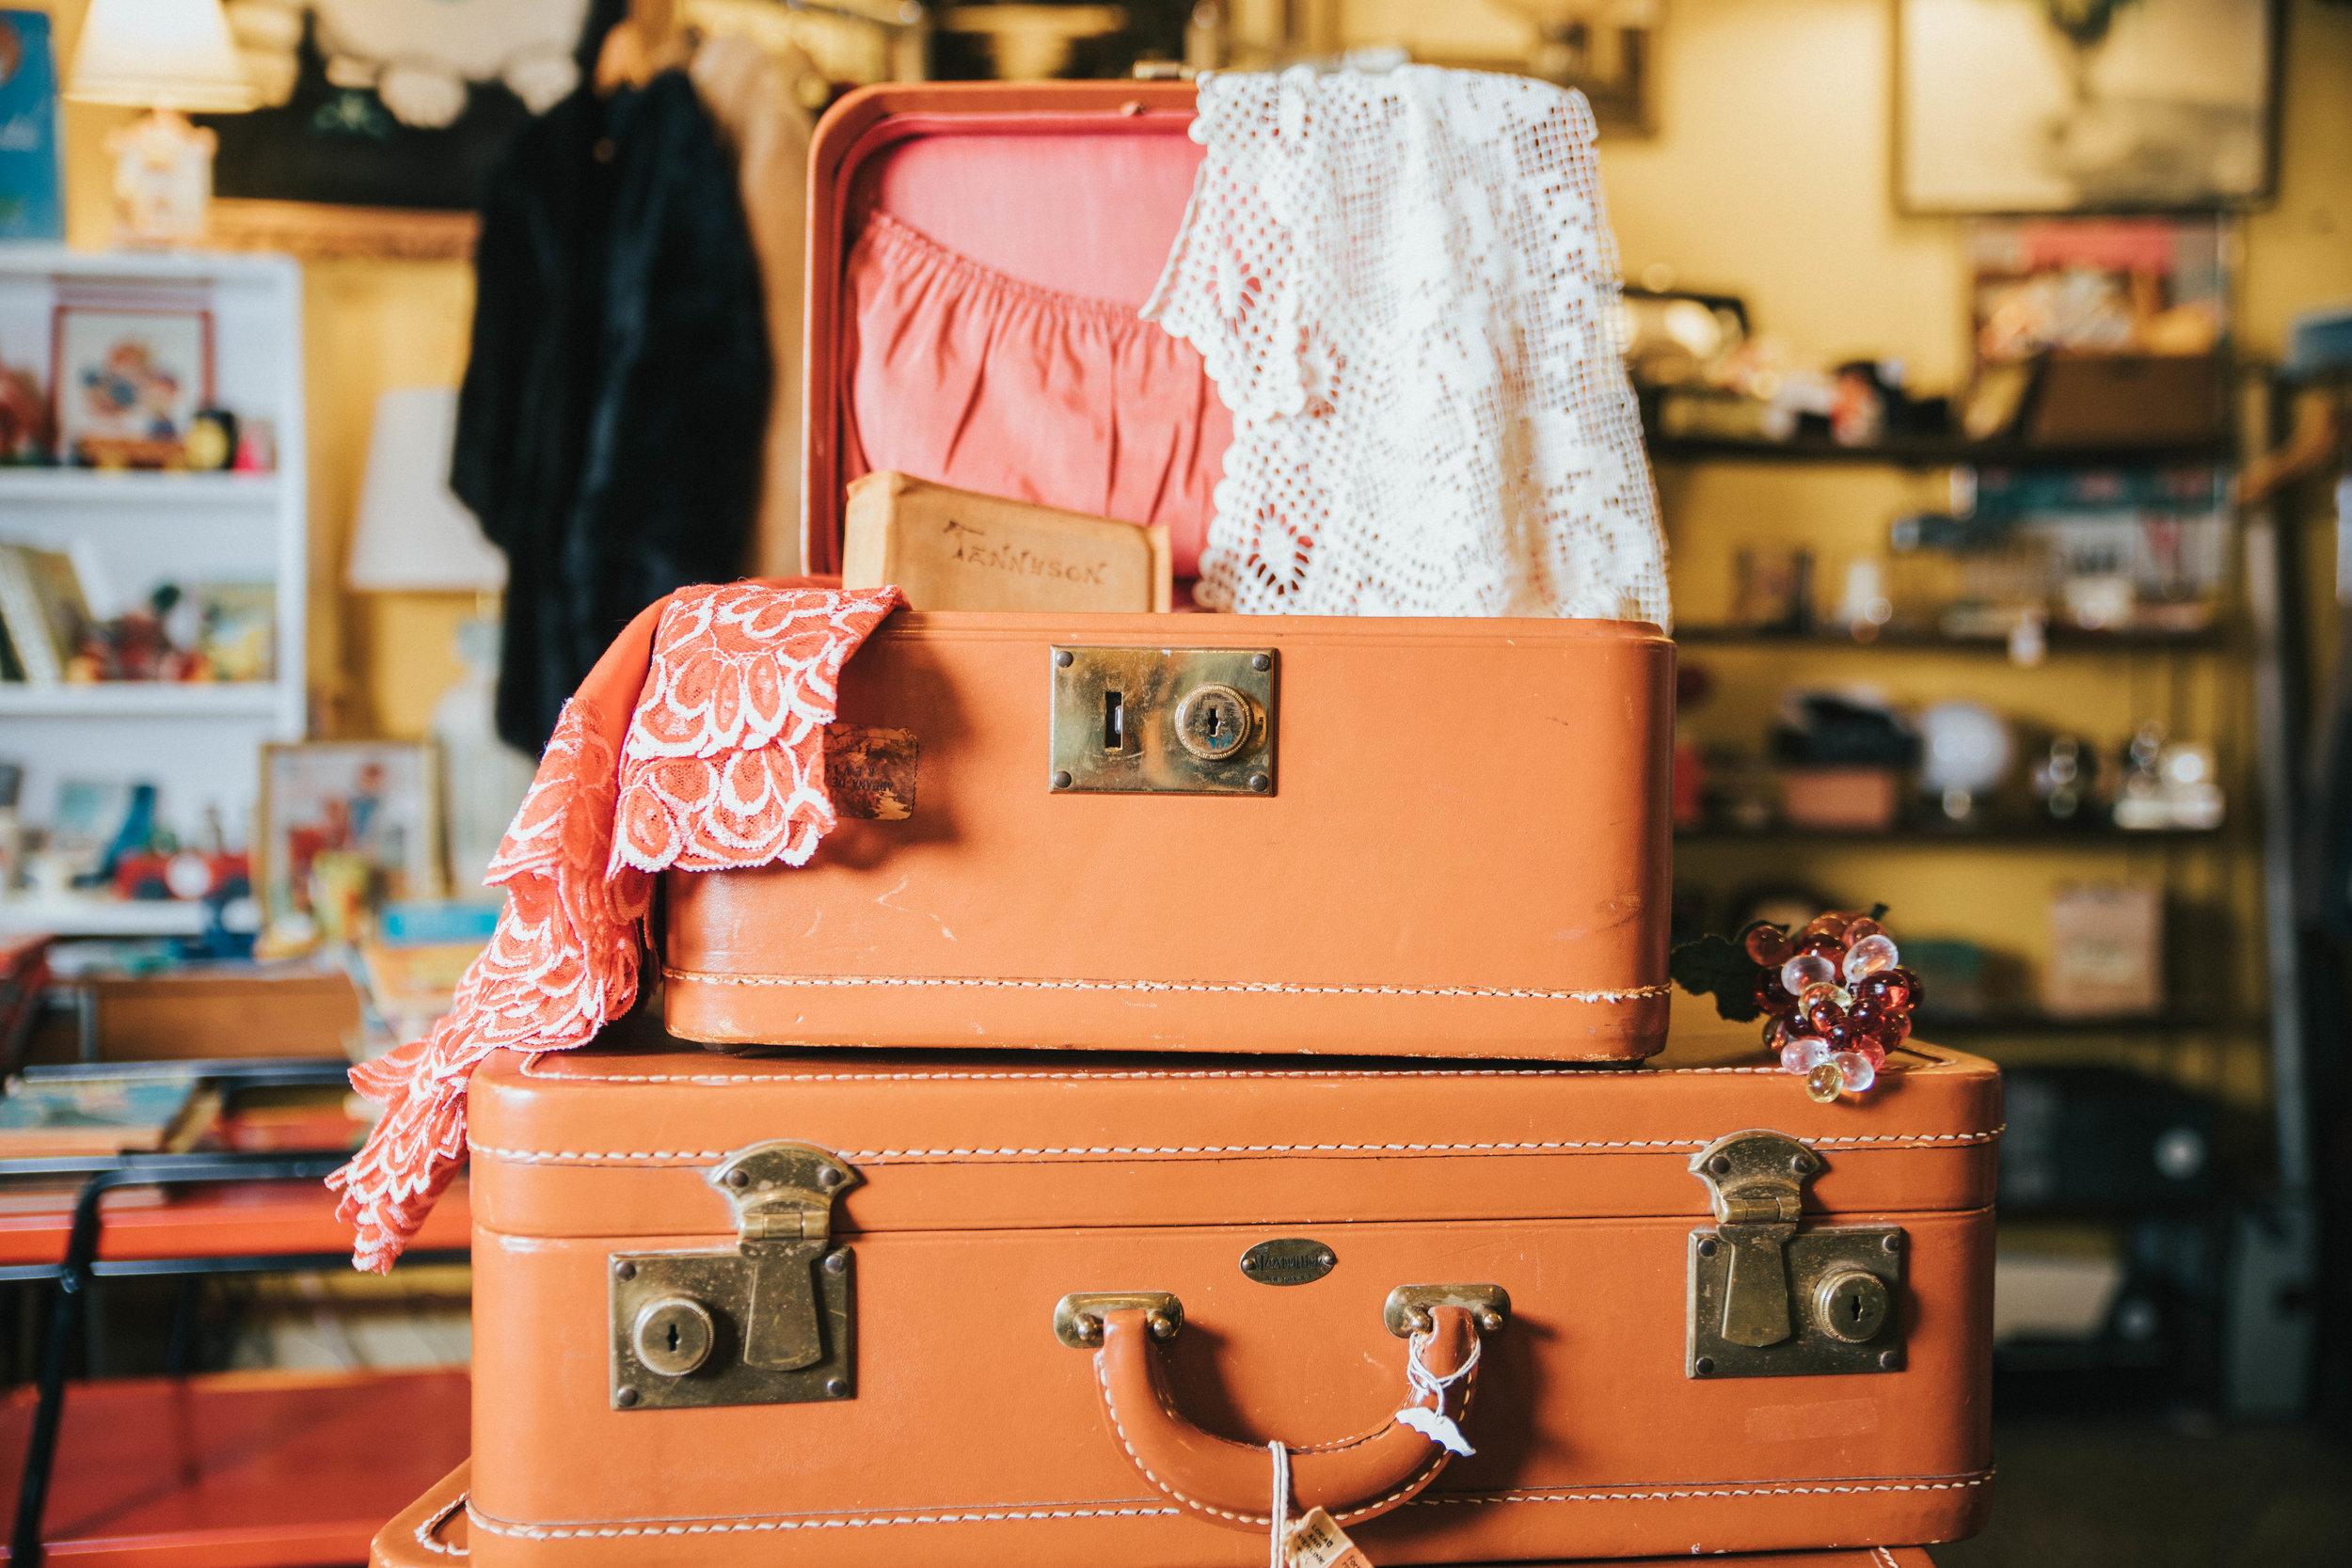 packing-for-china-shamira-west.jpg